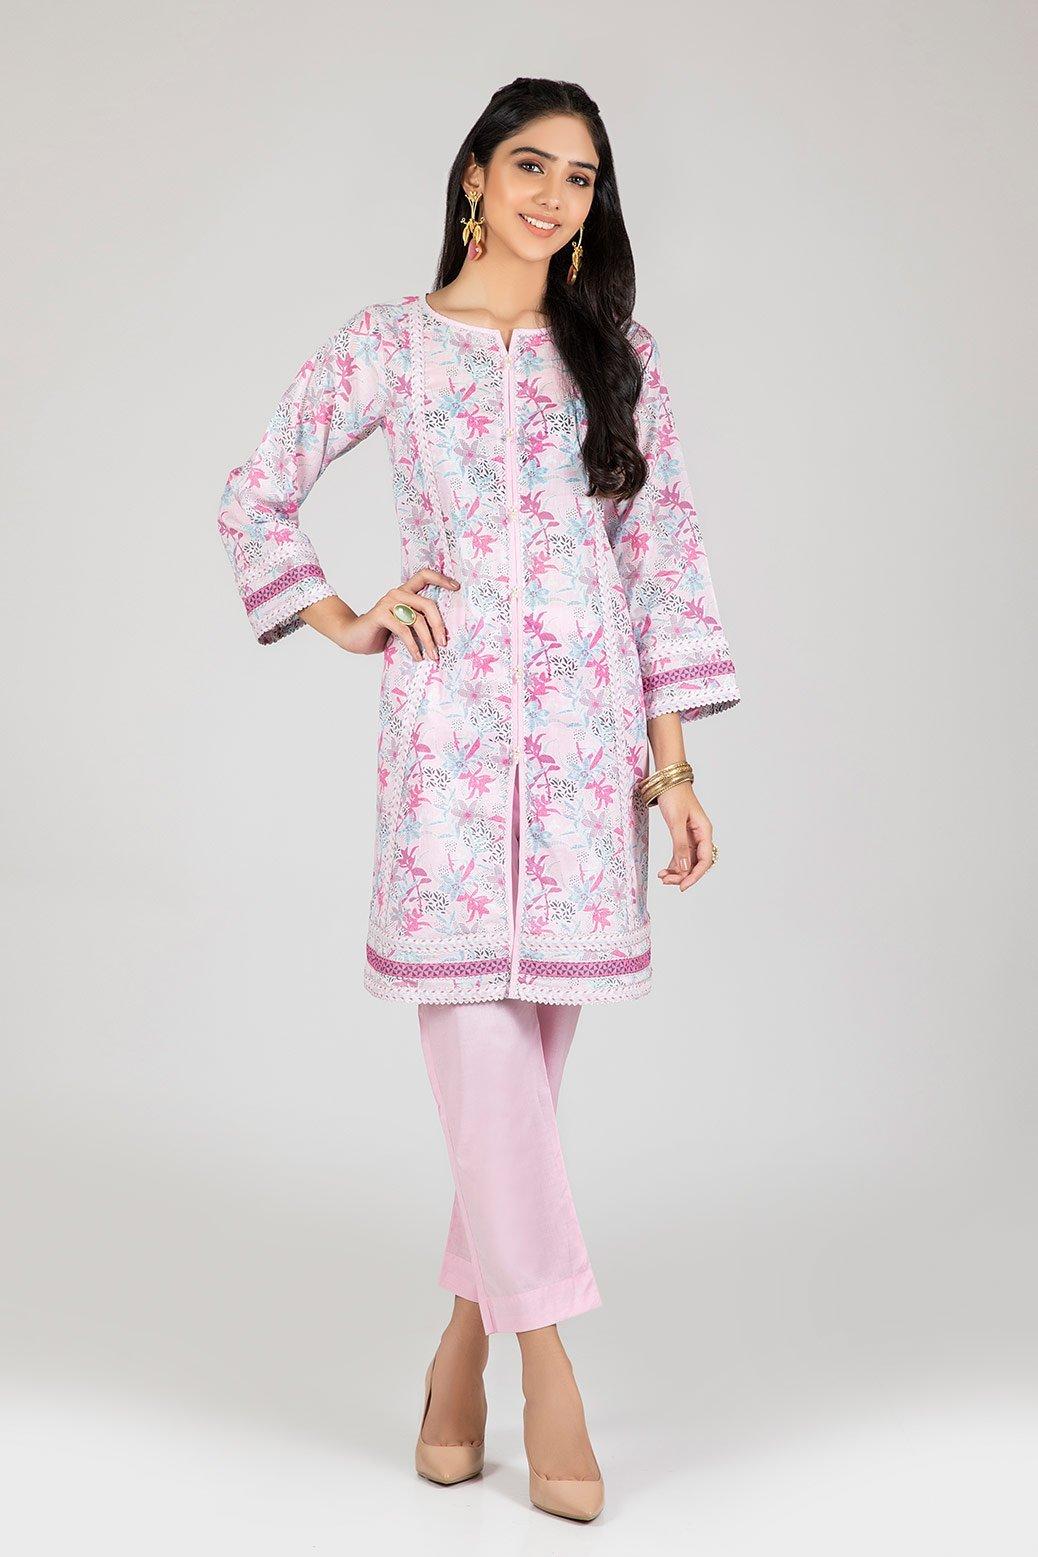 Bonanza Satrangi two piece dress Pink color